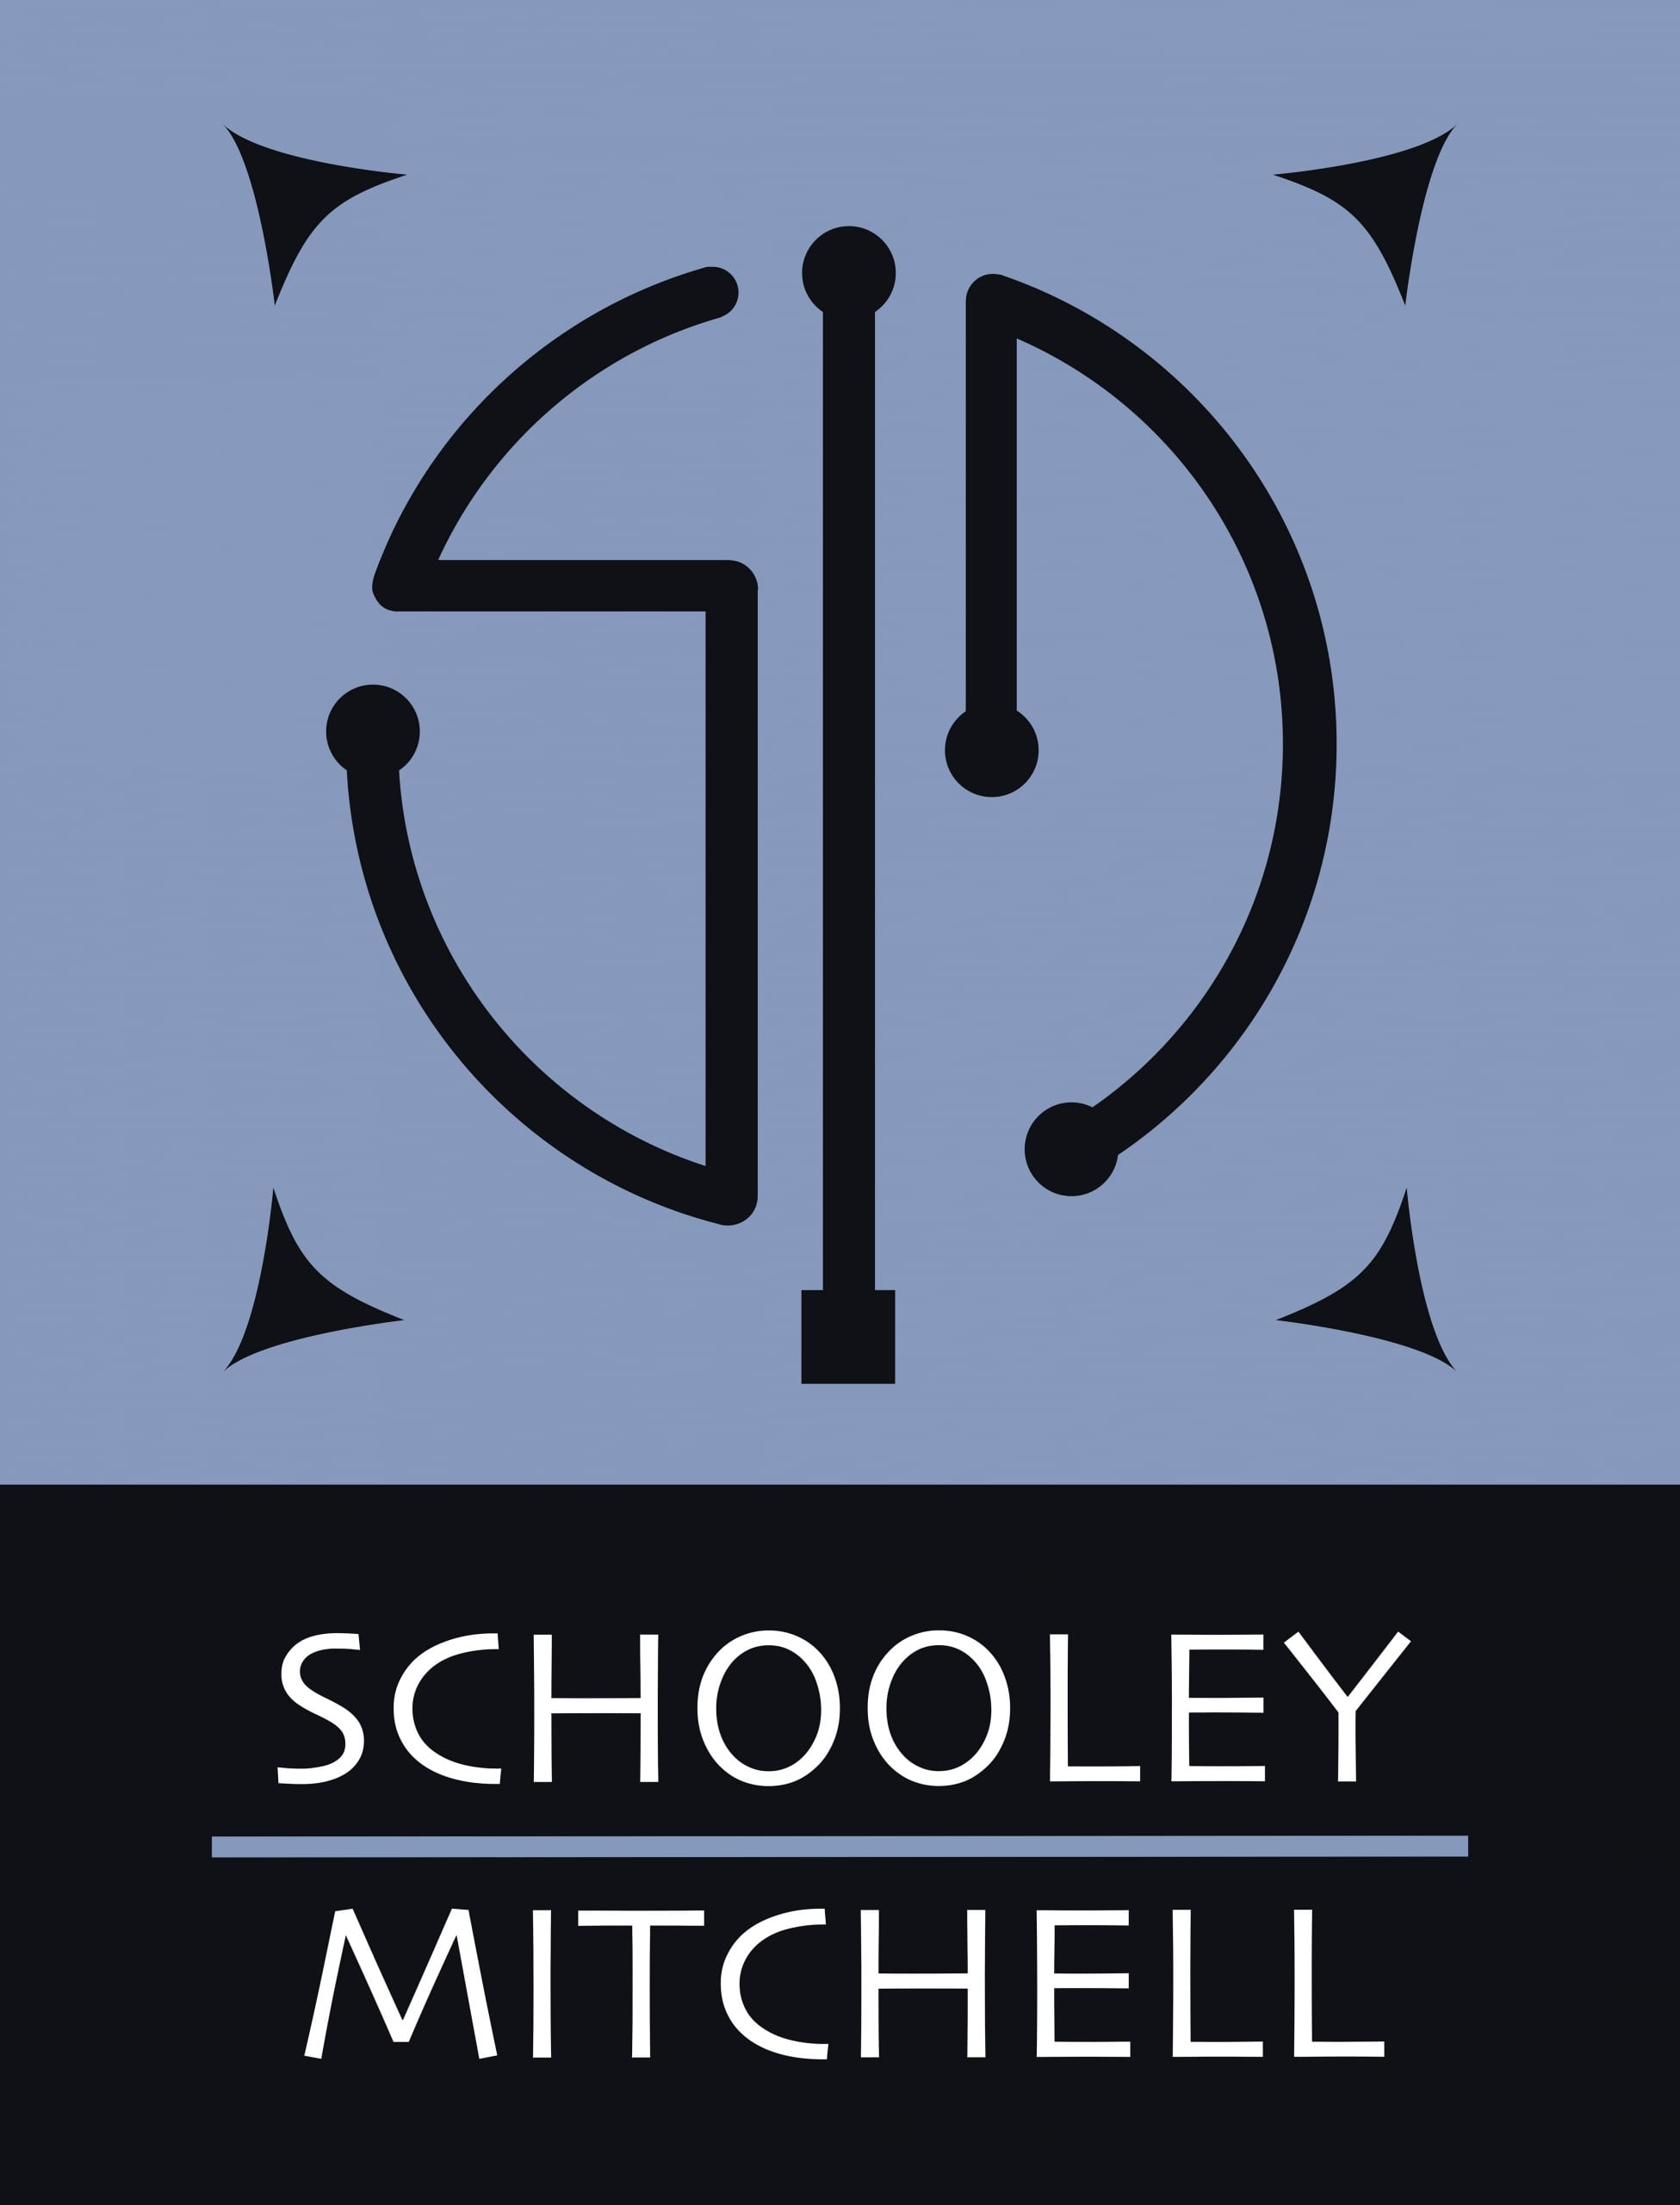 StrategyDriven Service Provider | Schooley Mitchell